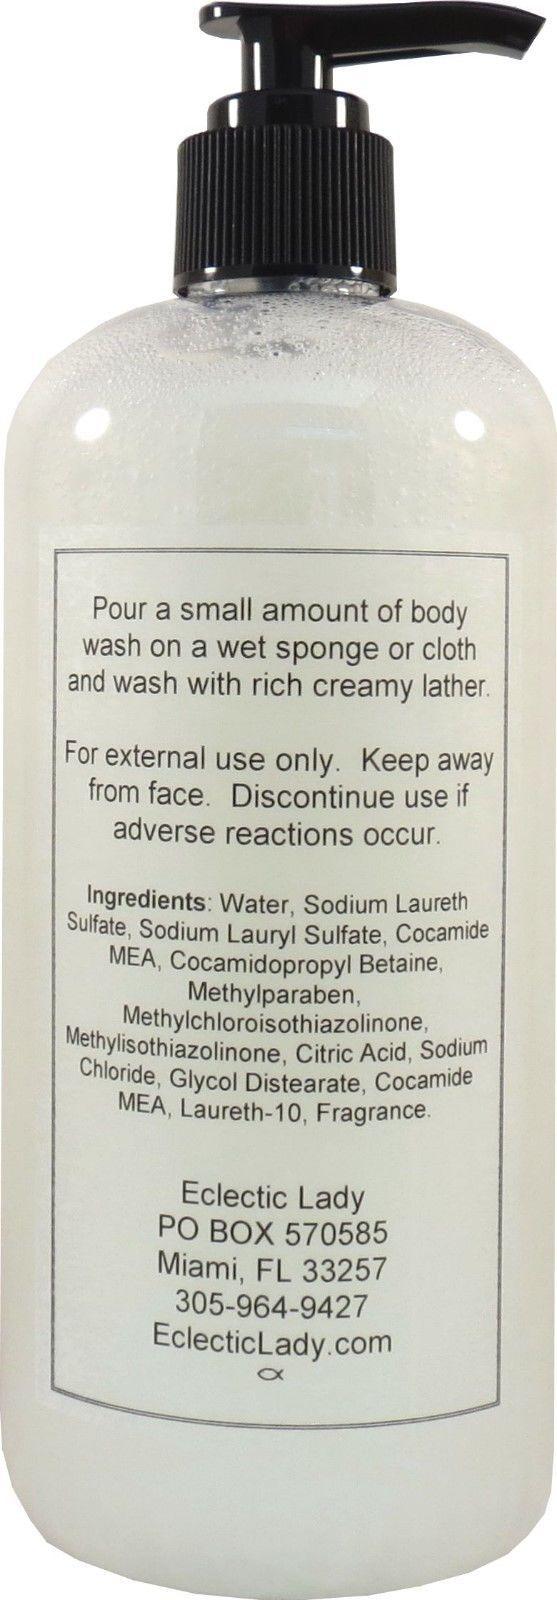 Bayberry Body Wash